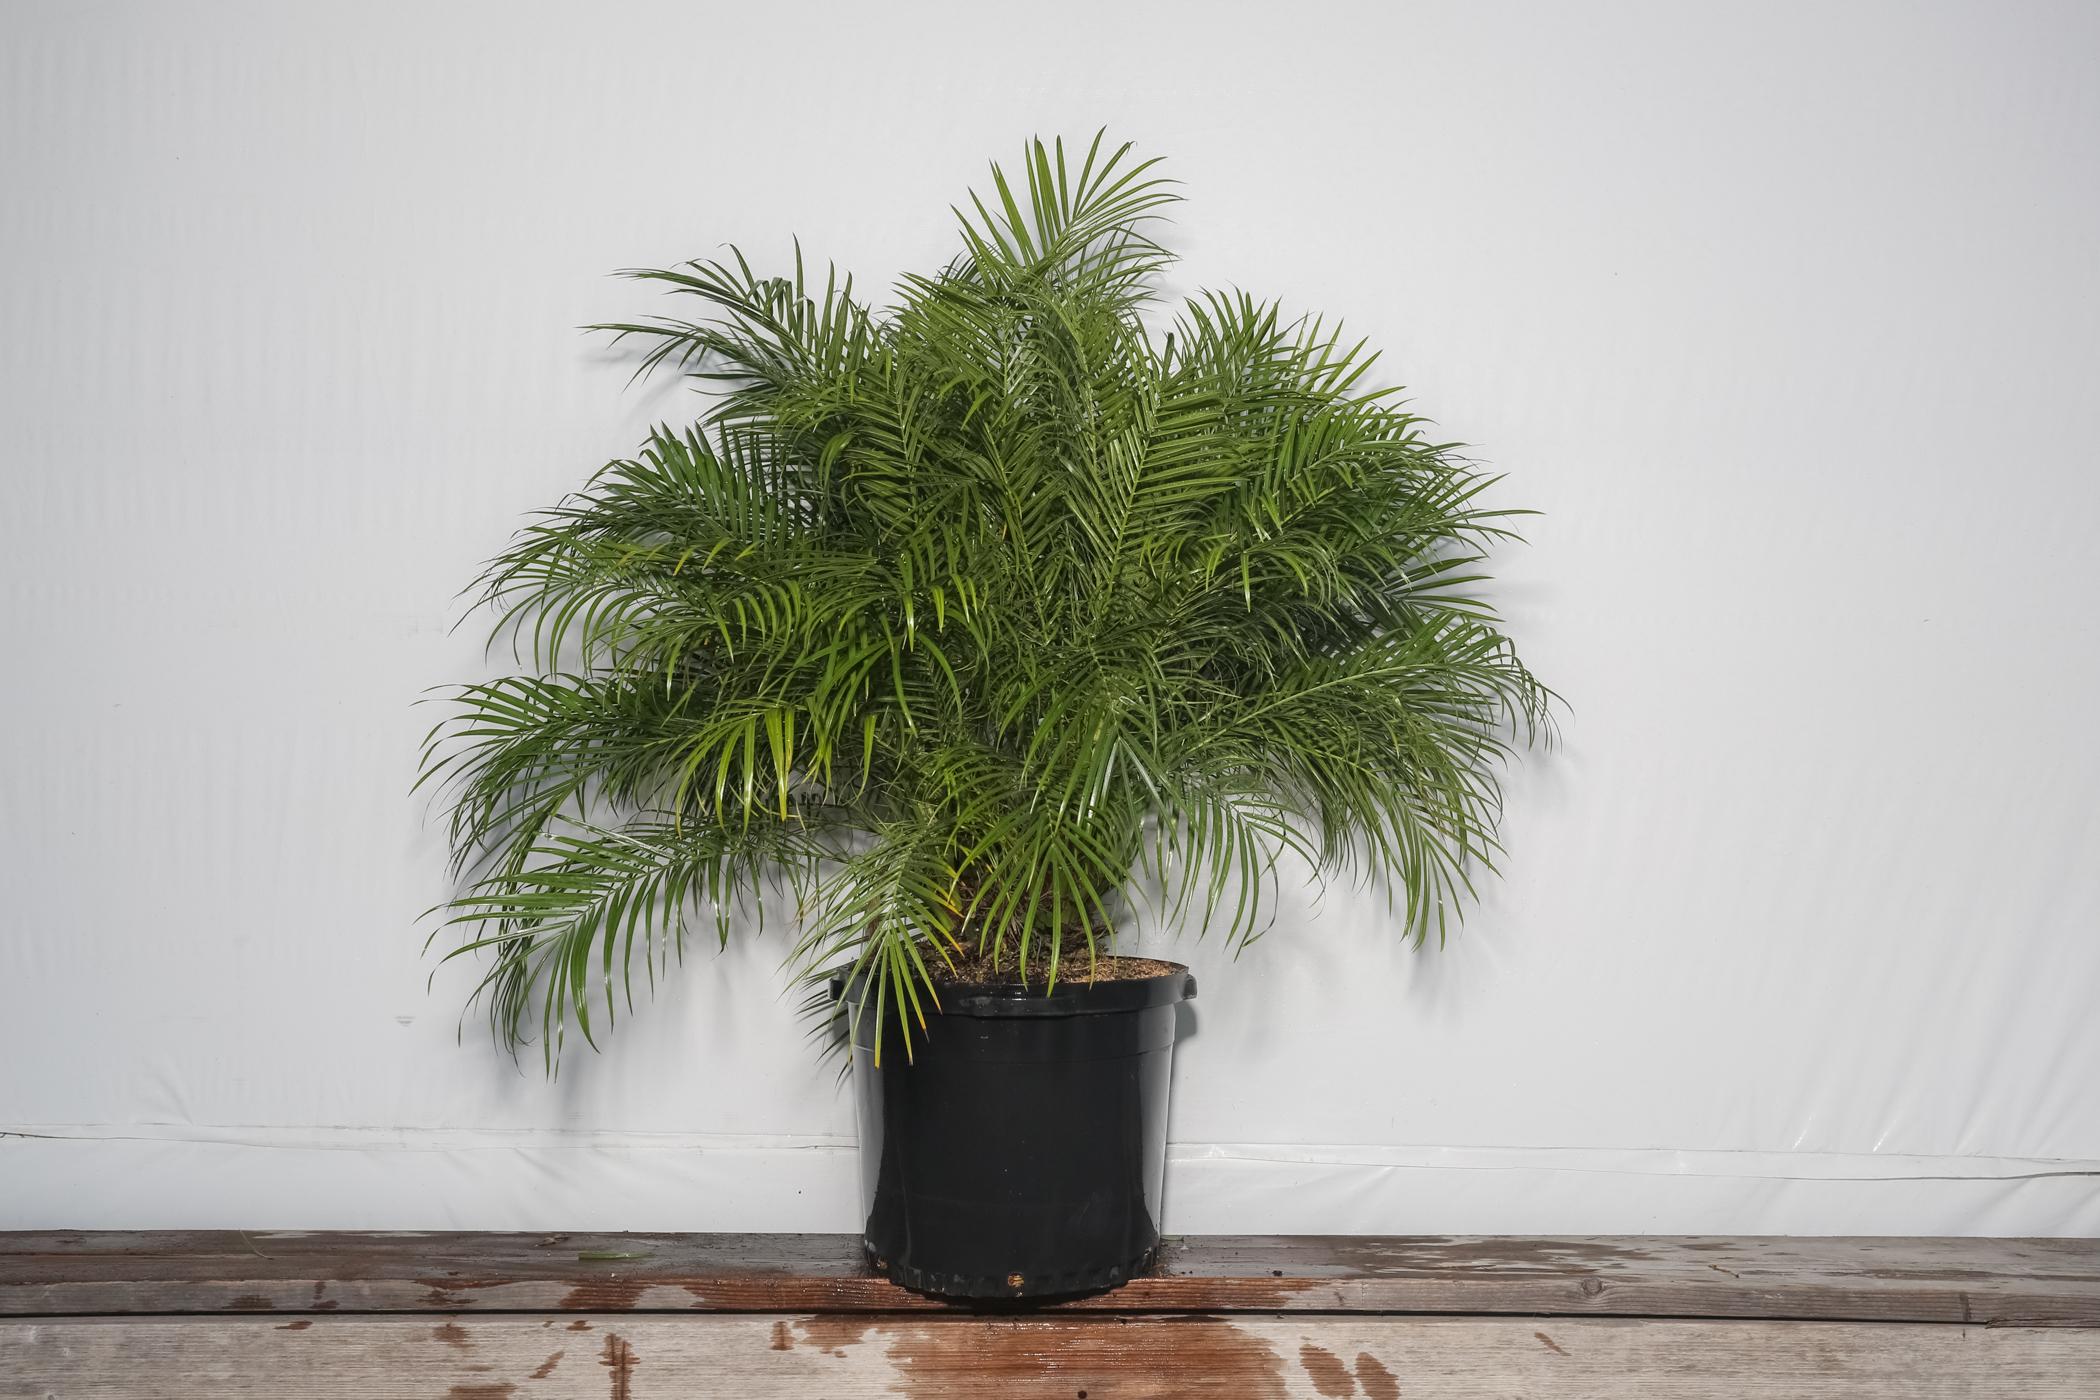 Roebelenii Palm 7 Gallon